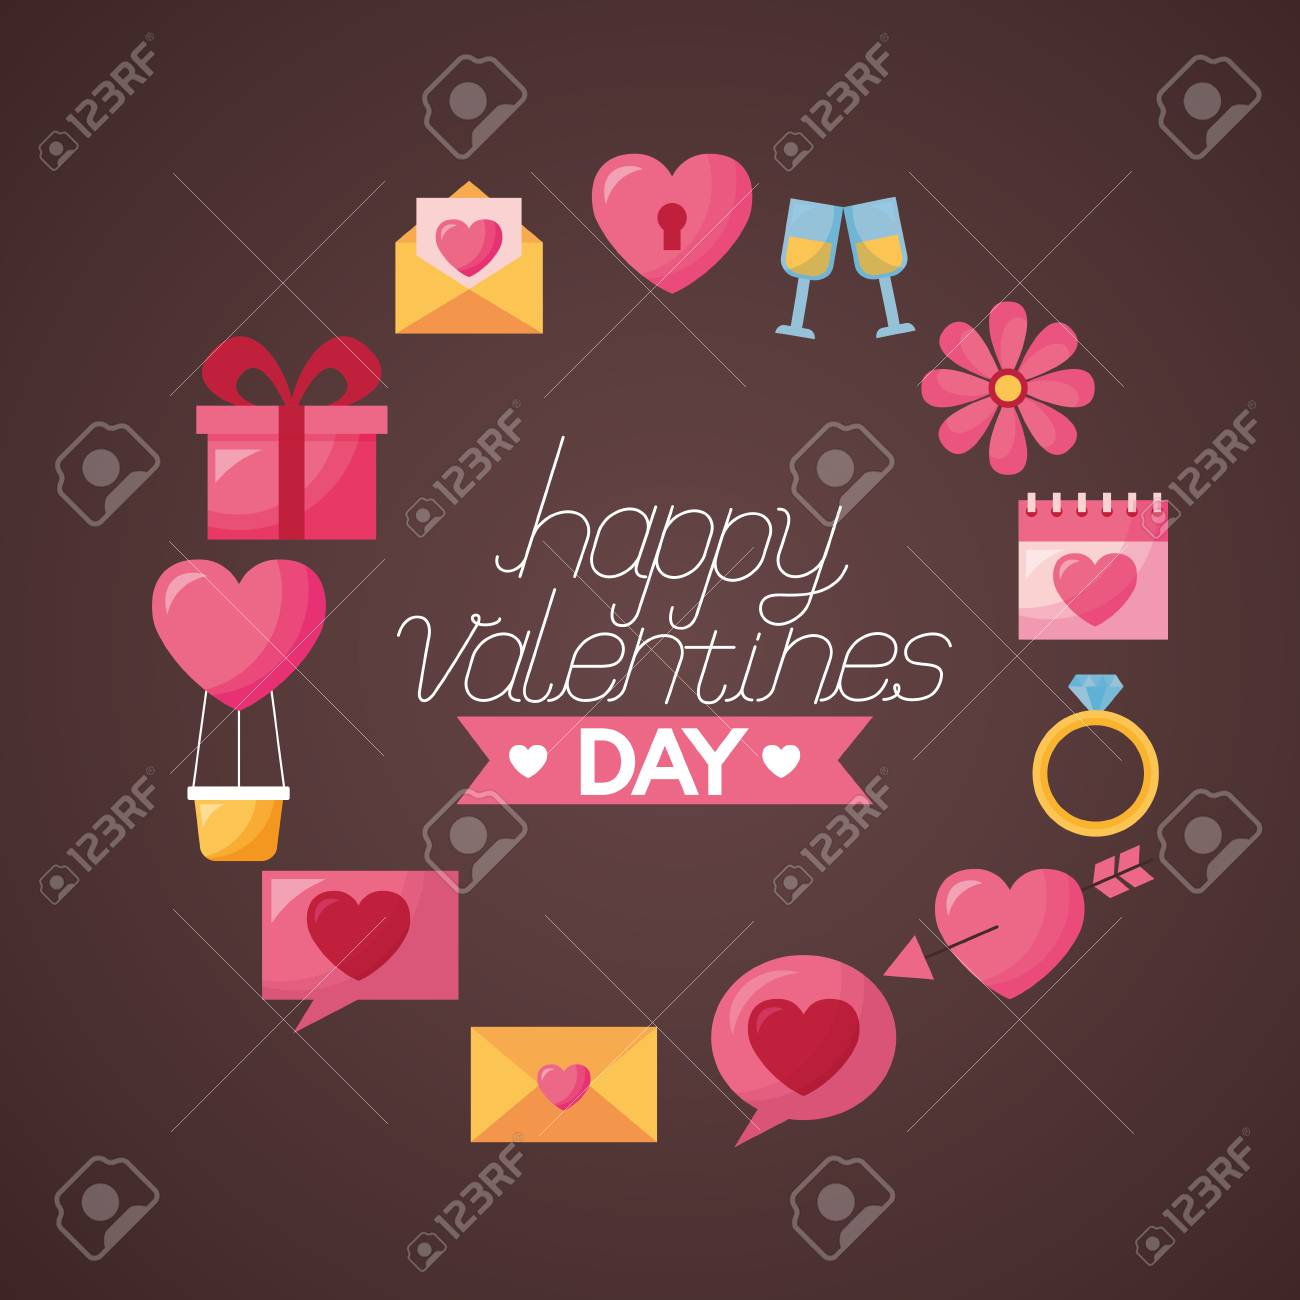 Valentine Day Frame Gift Message Heart Flower Arrow Balloon Vector